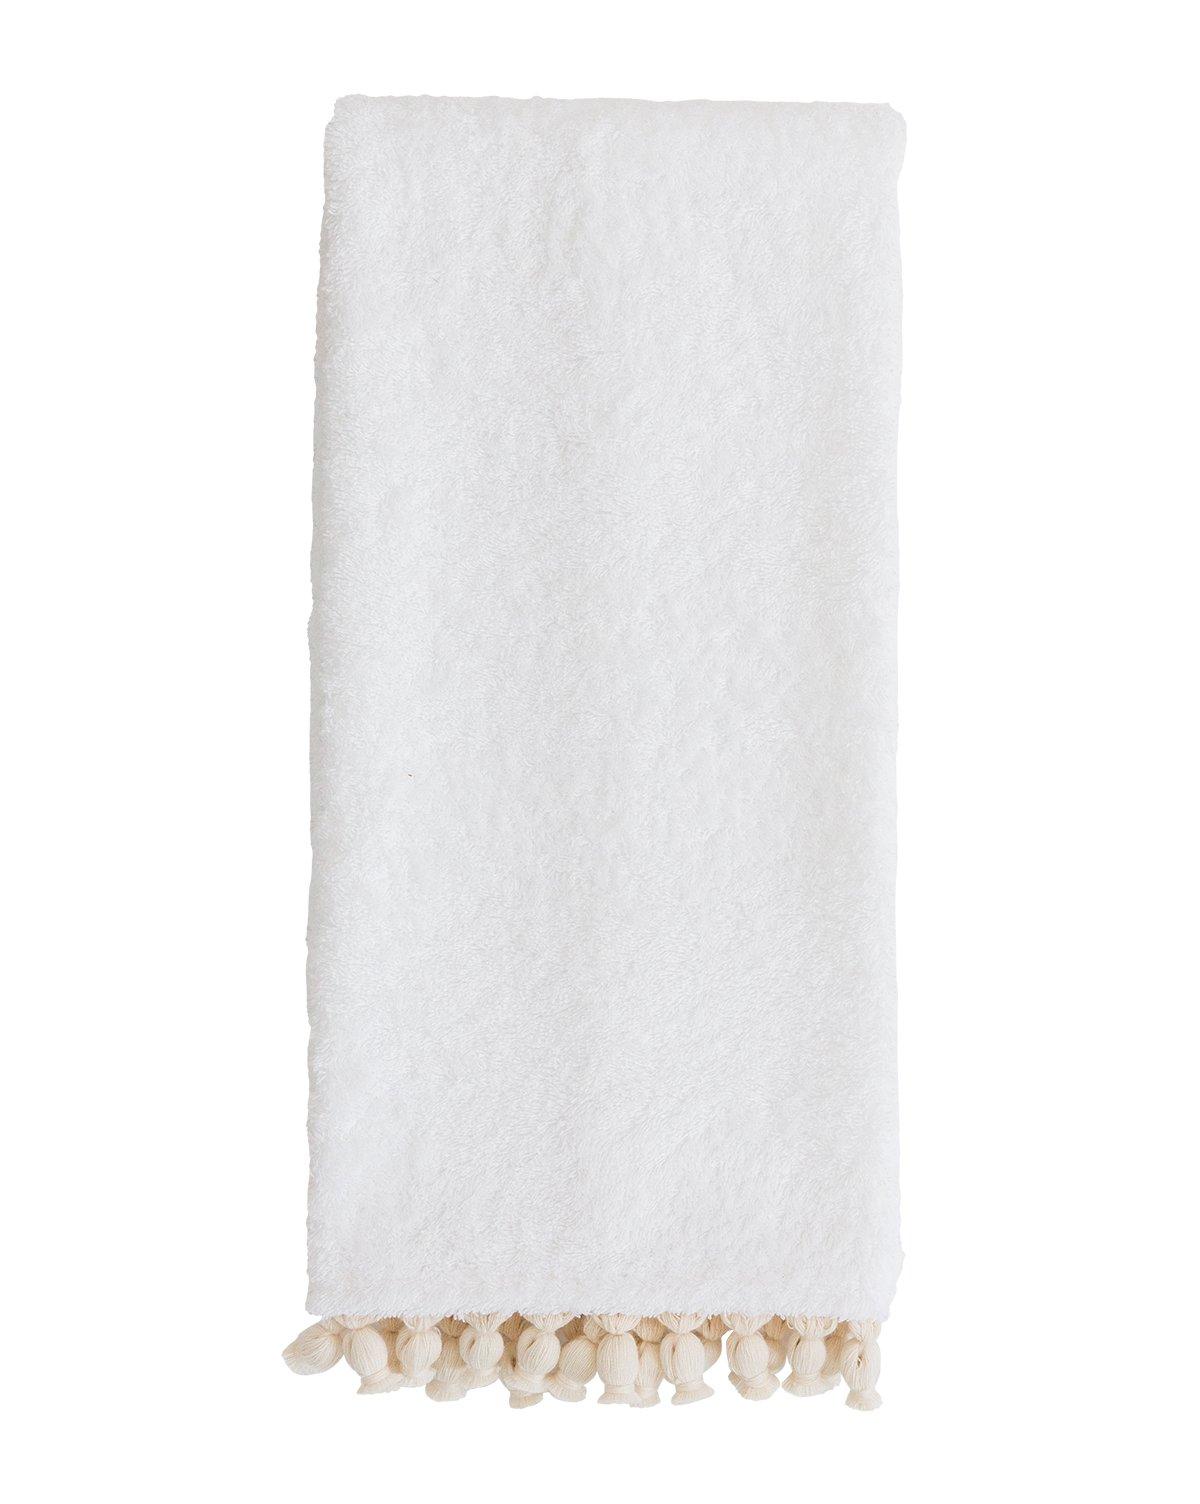 valencia_hand_towel3.jpg